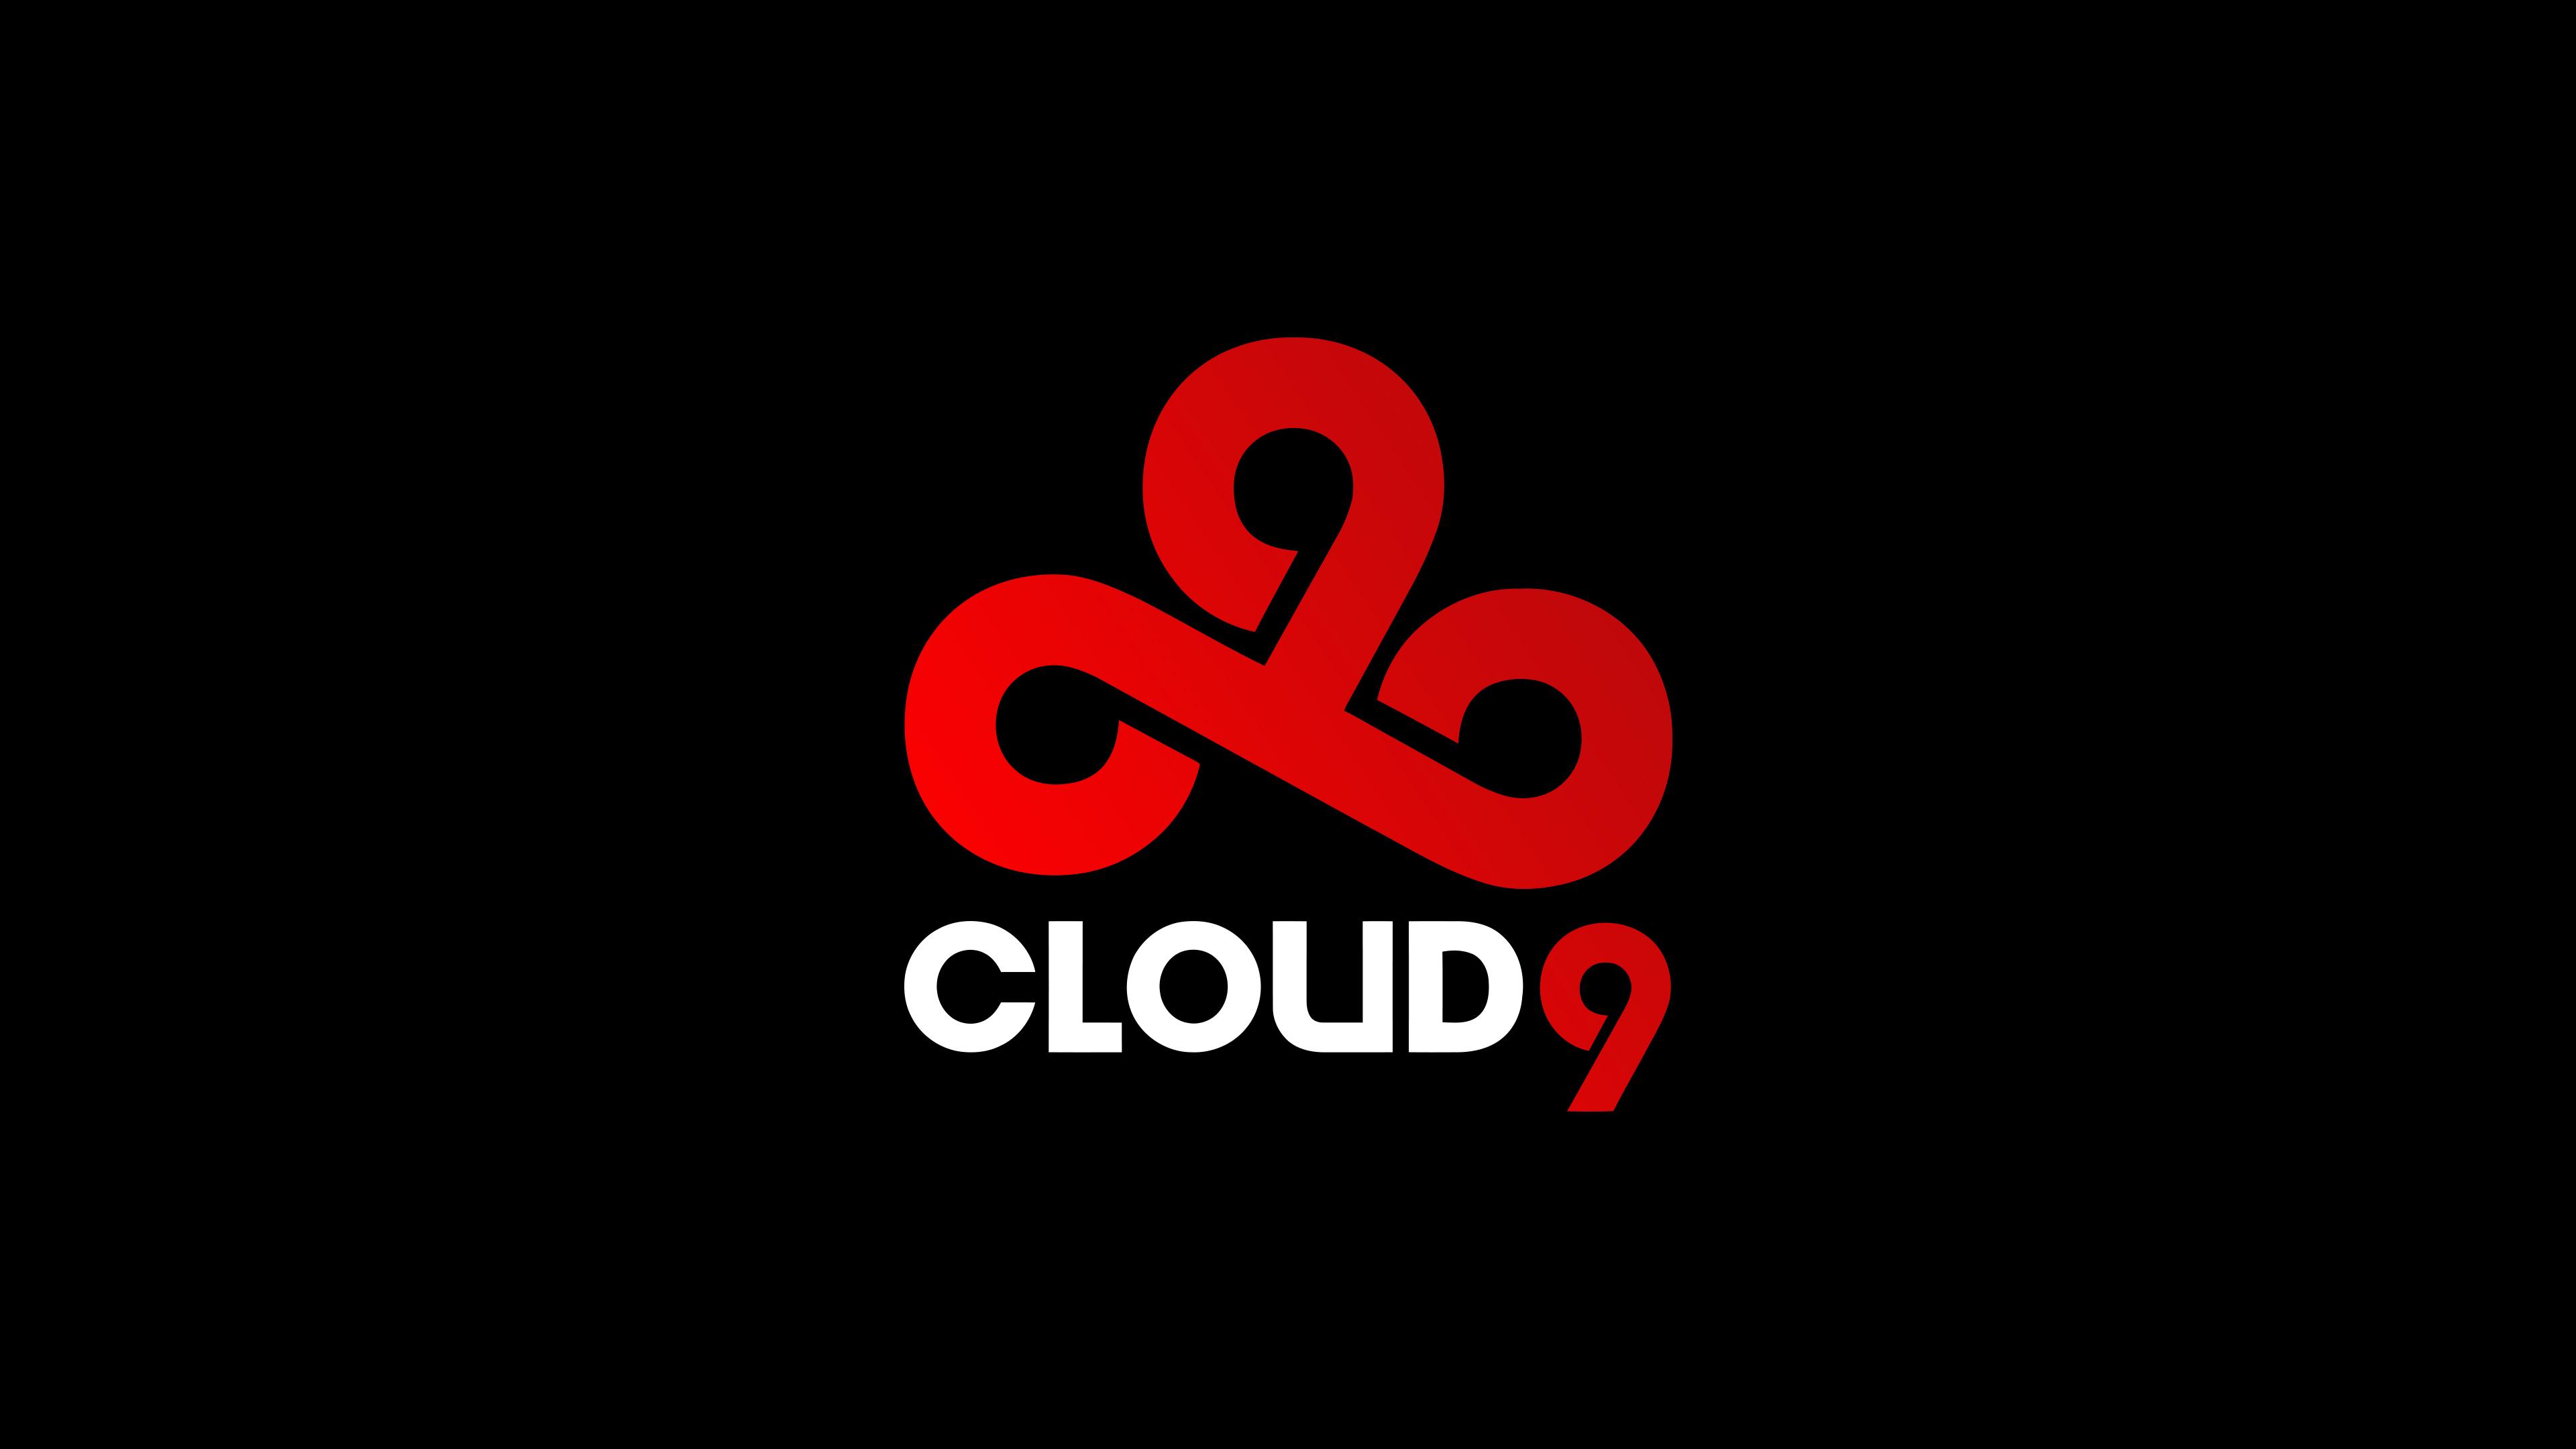 Cloud 9 Lolwallpapers